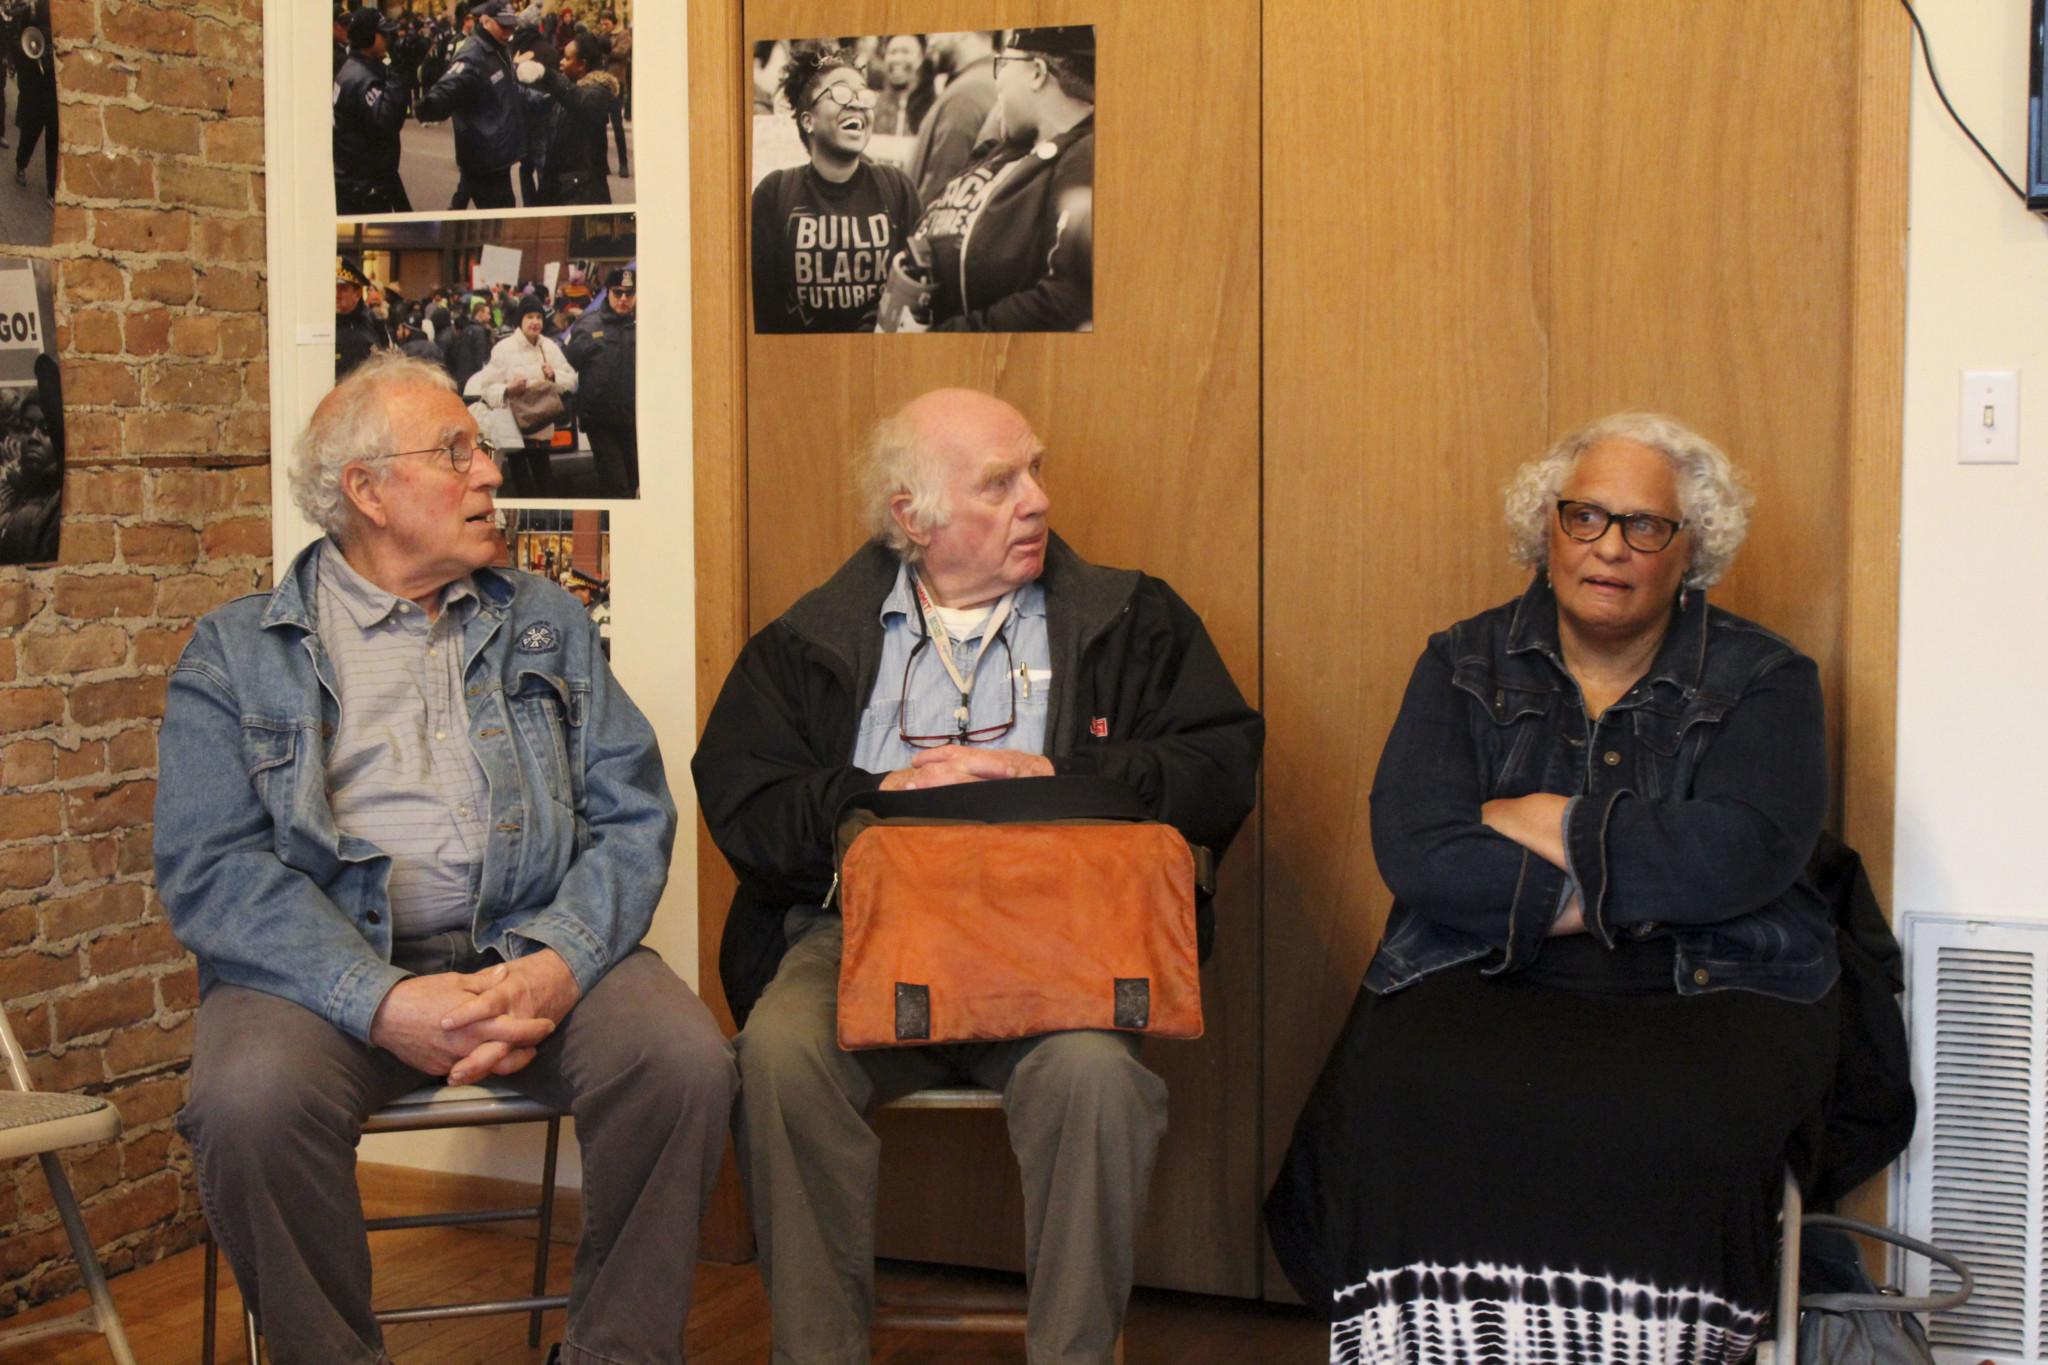 L-R: Peter Kuttner, Bruce Thomas, Mary Scott-Boria (Maddie Anderson)